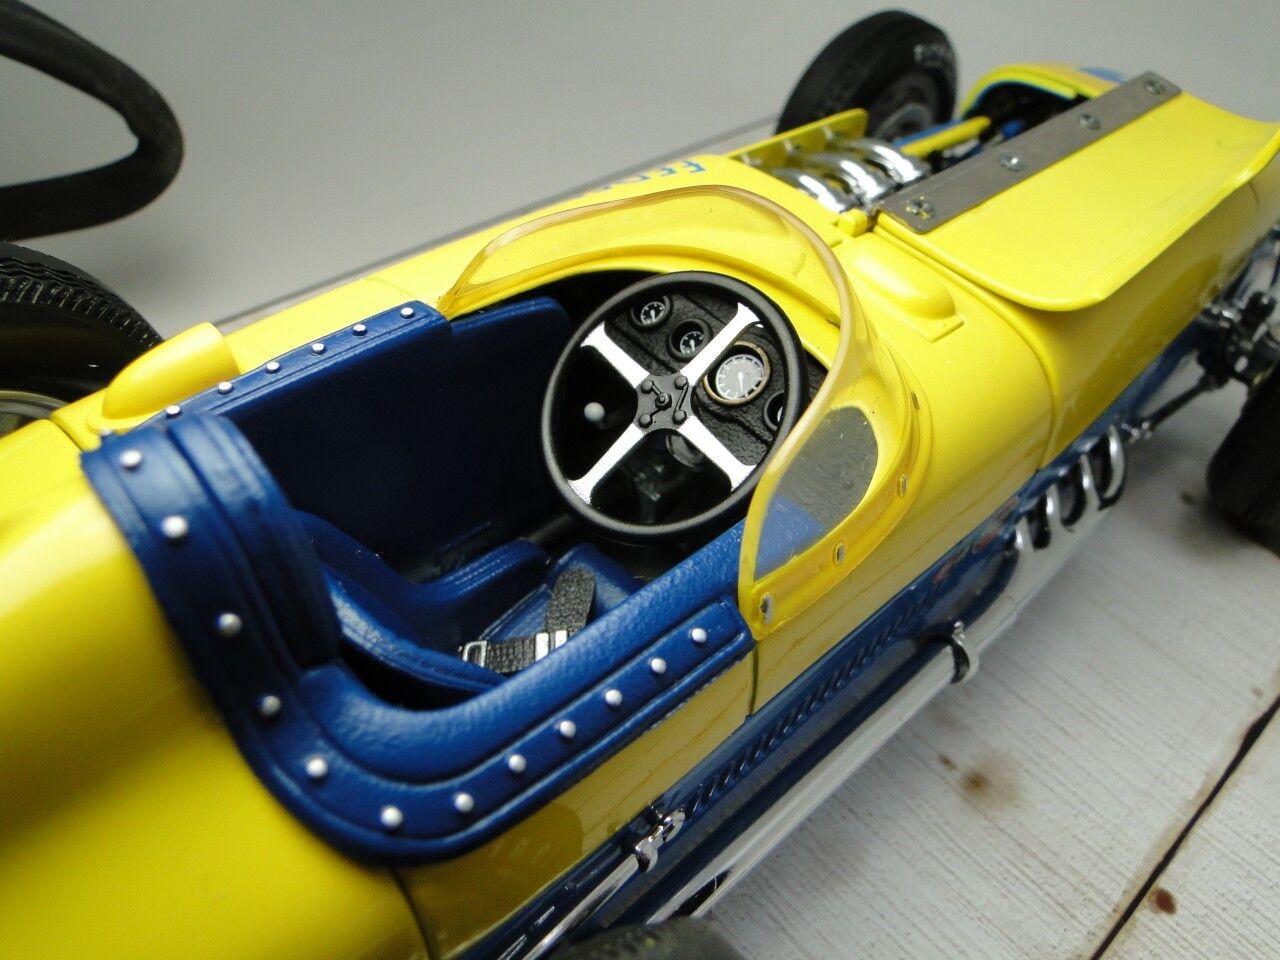 ventas de salida 1 Vintage Grand Prix F Ford Racer Race Car Car Car Sport 12 Indy 43 500 24 Metal 18 gt40 1966 GT  Vuelta de 10 dias